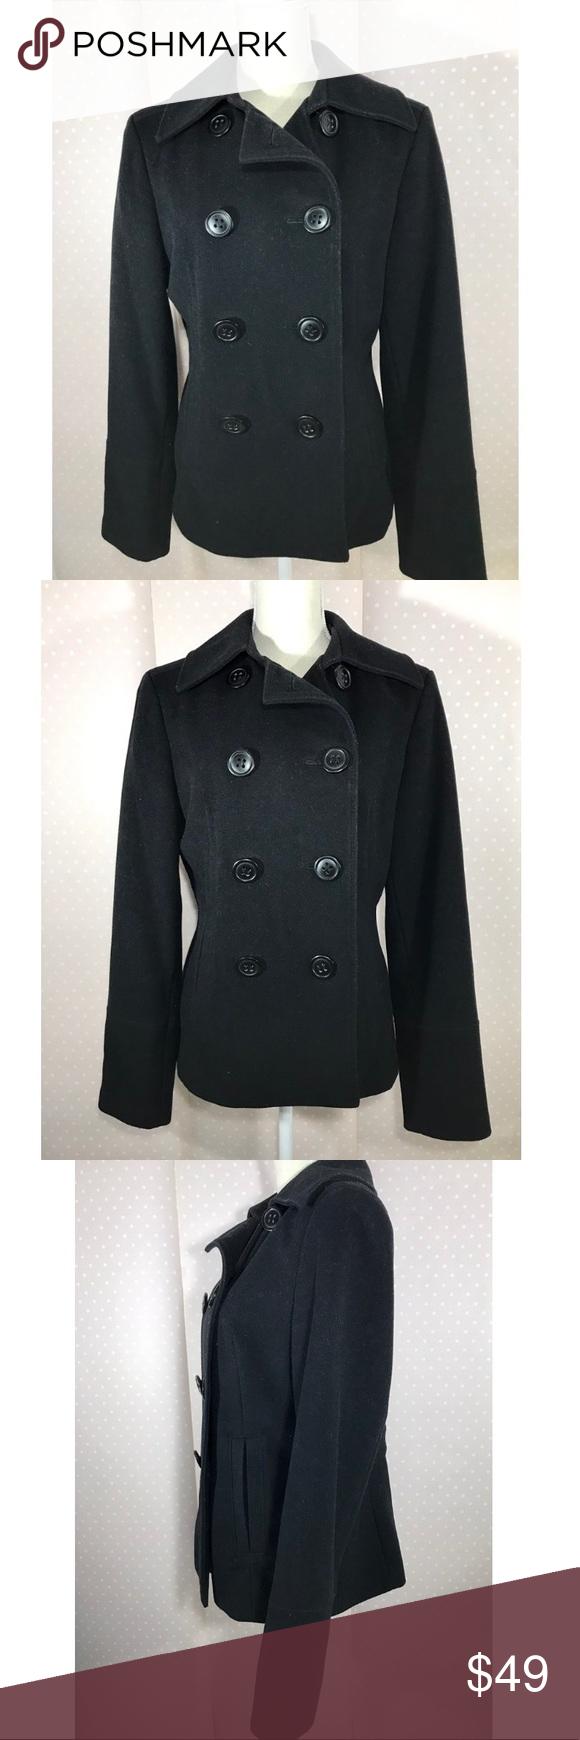 {Express} wool Cashmere blend pea coat black heavy Black